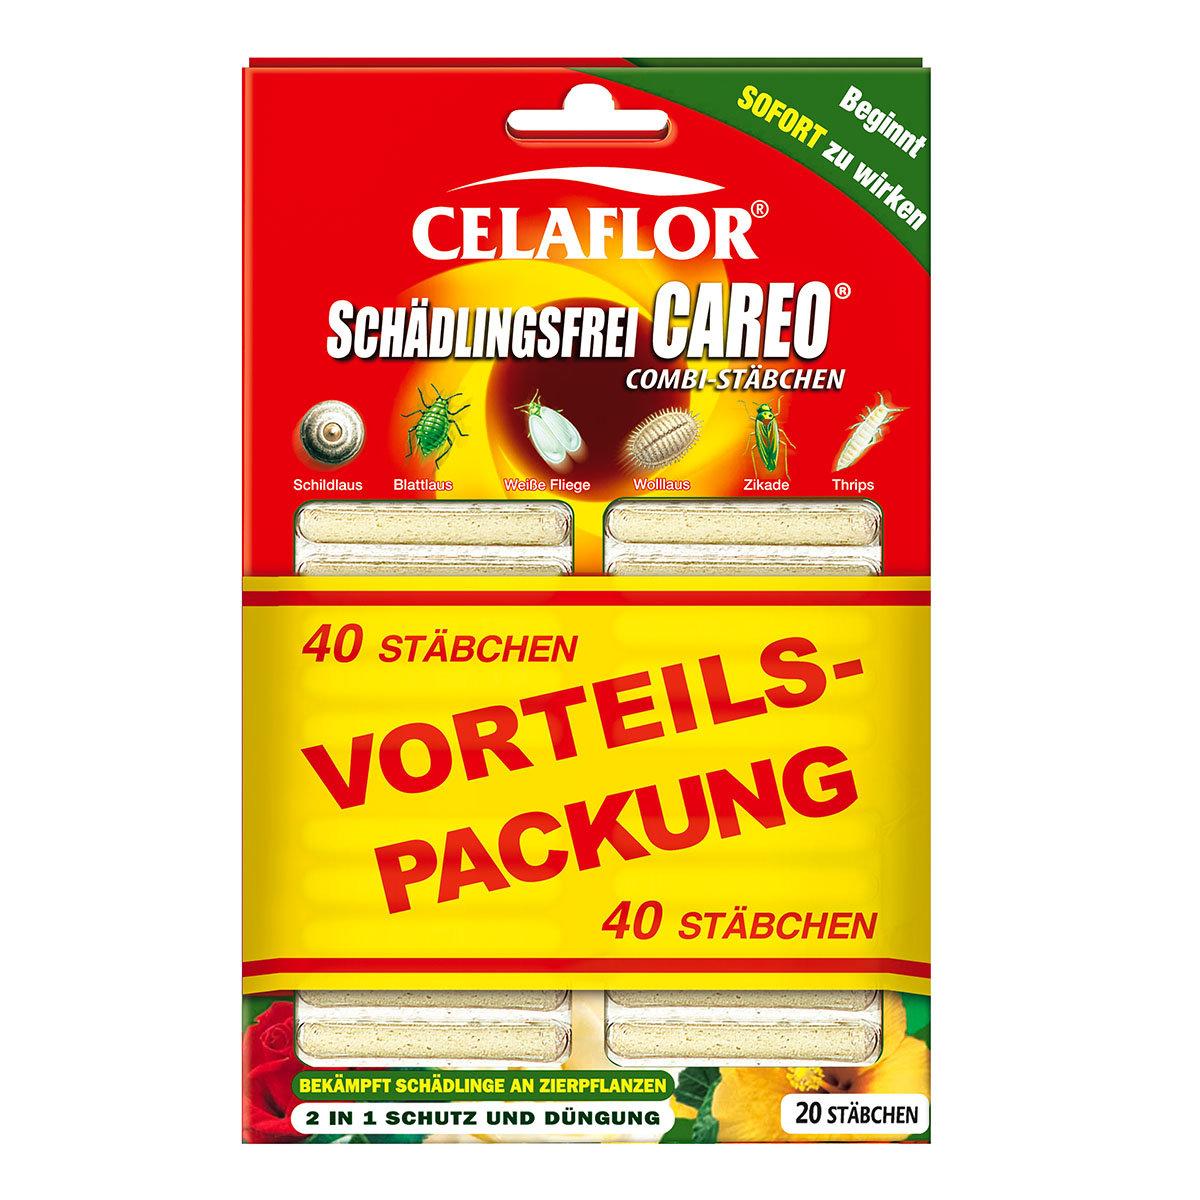 Celaflor Schädlingsfrei Careo Combi-Stäbchen, 40 Stück